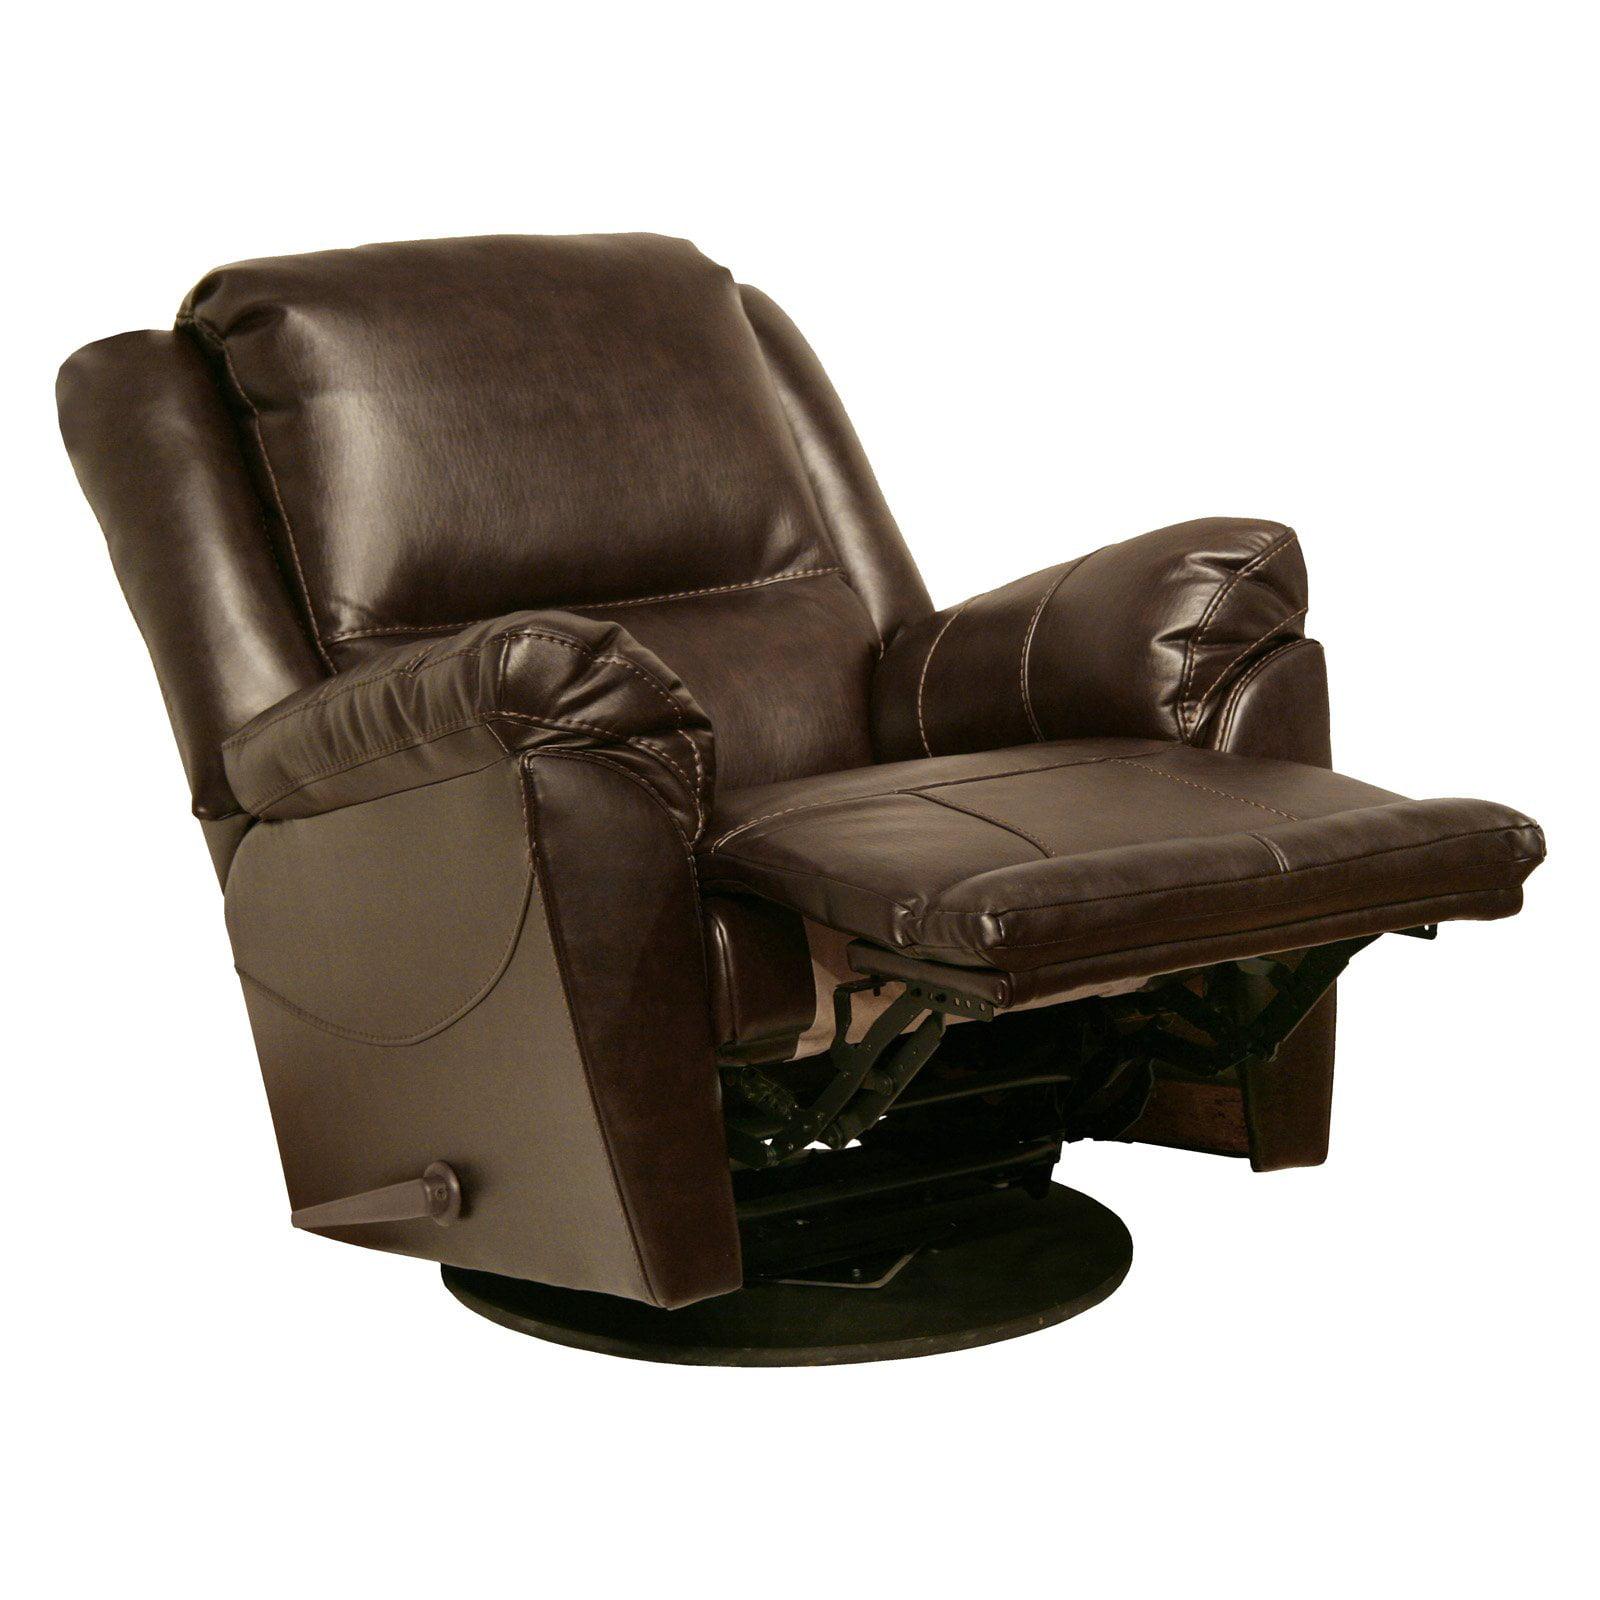 sc 1 st  Walmart & Catnapper Maverick Chaise Leather Swivel Glider Recliner - Walmart.com islam-shia.org